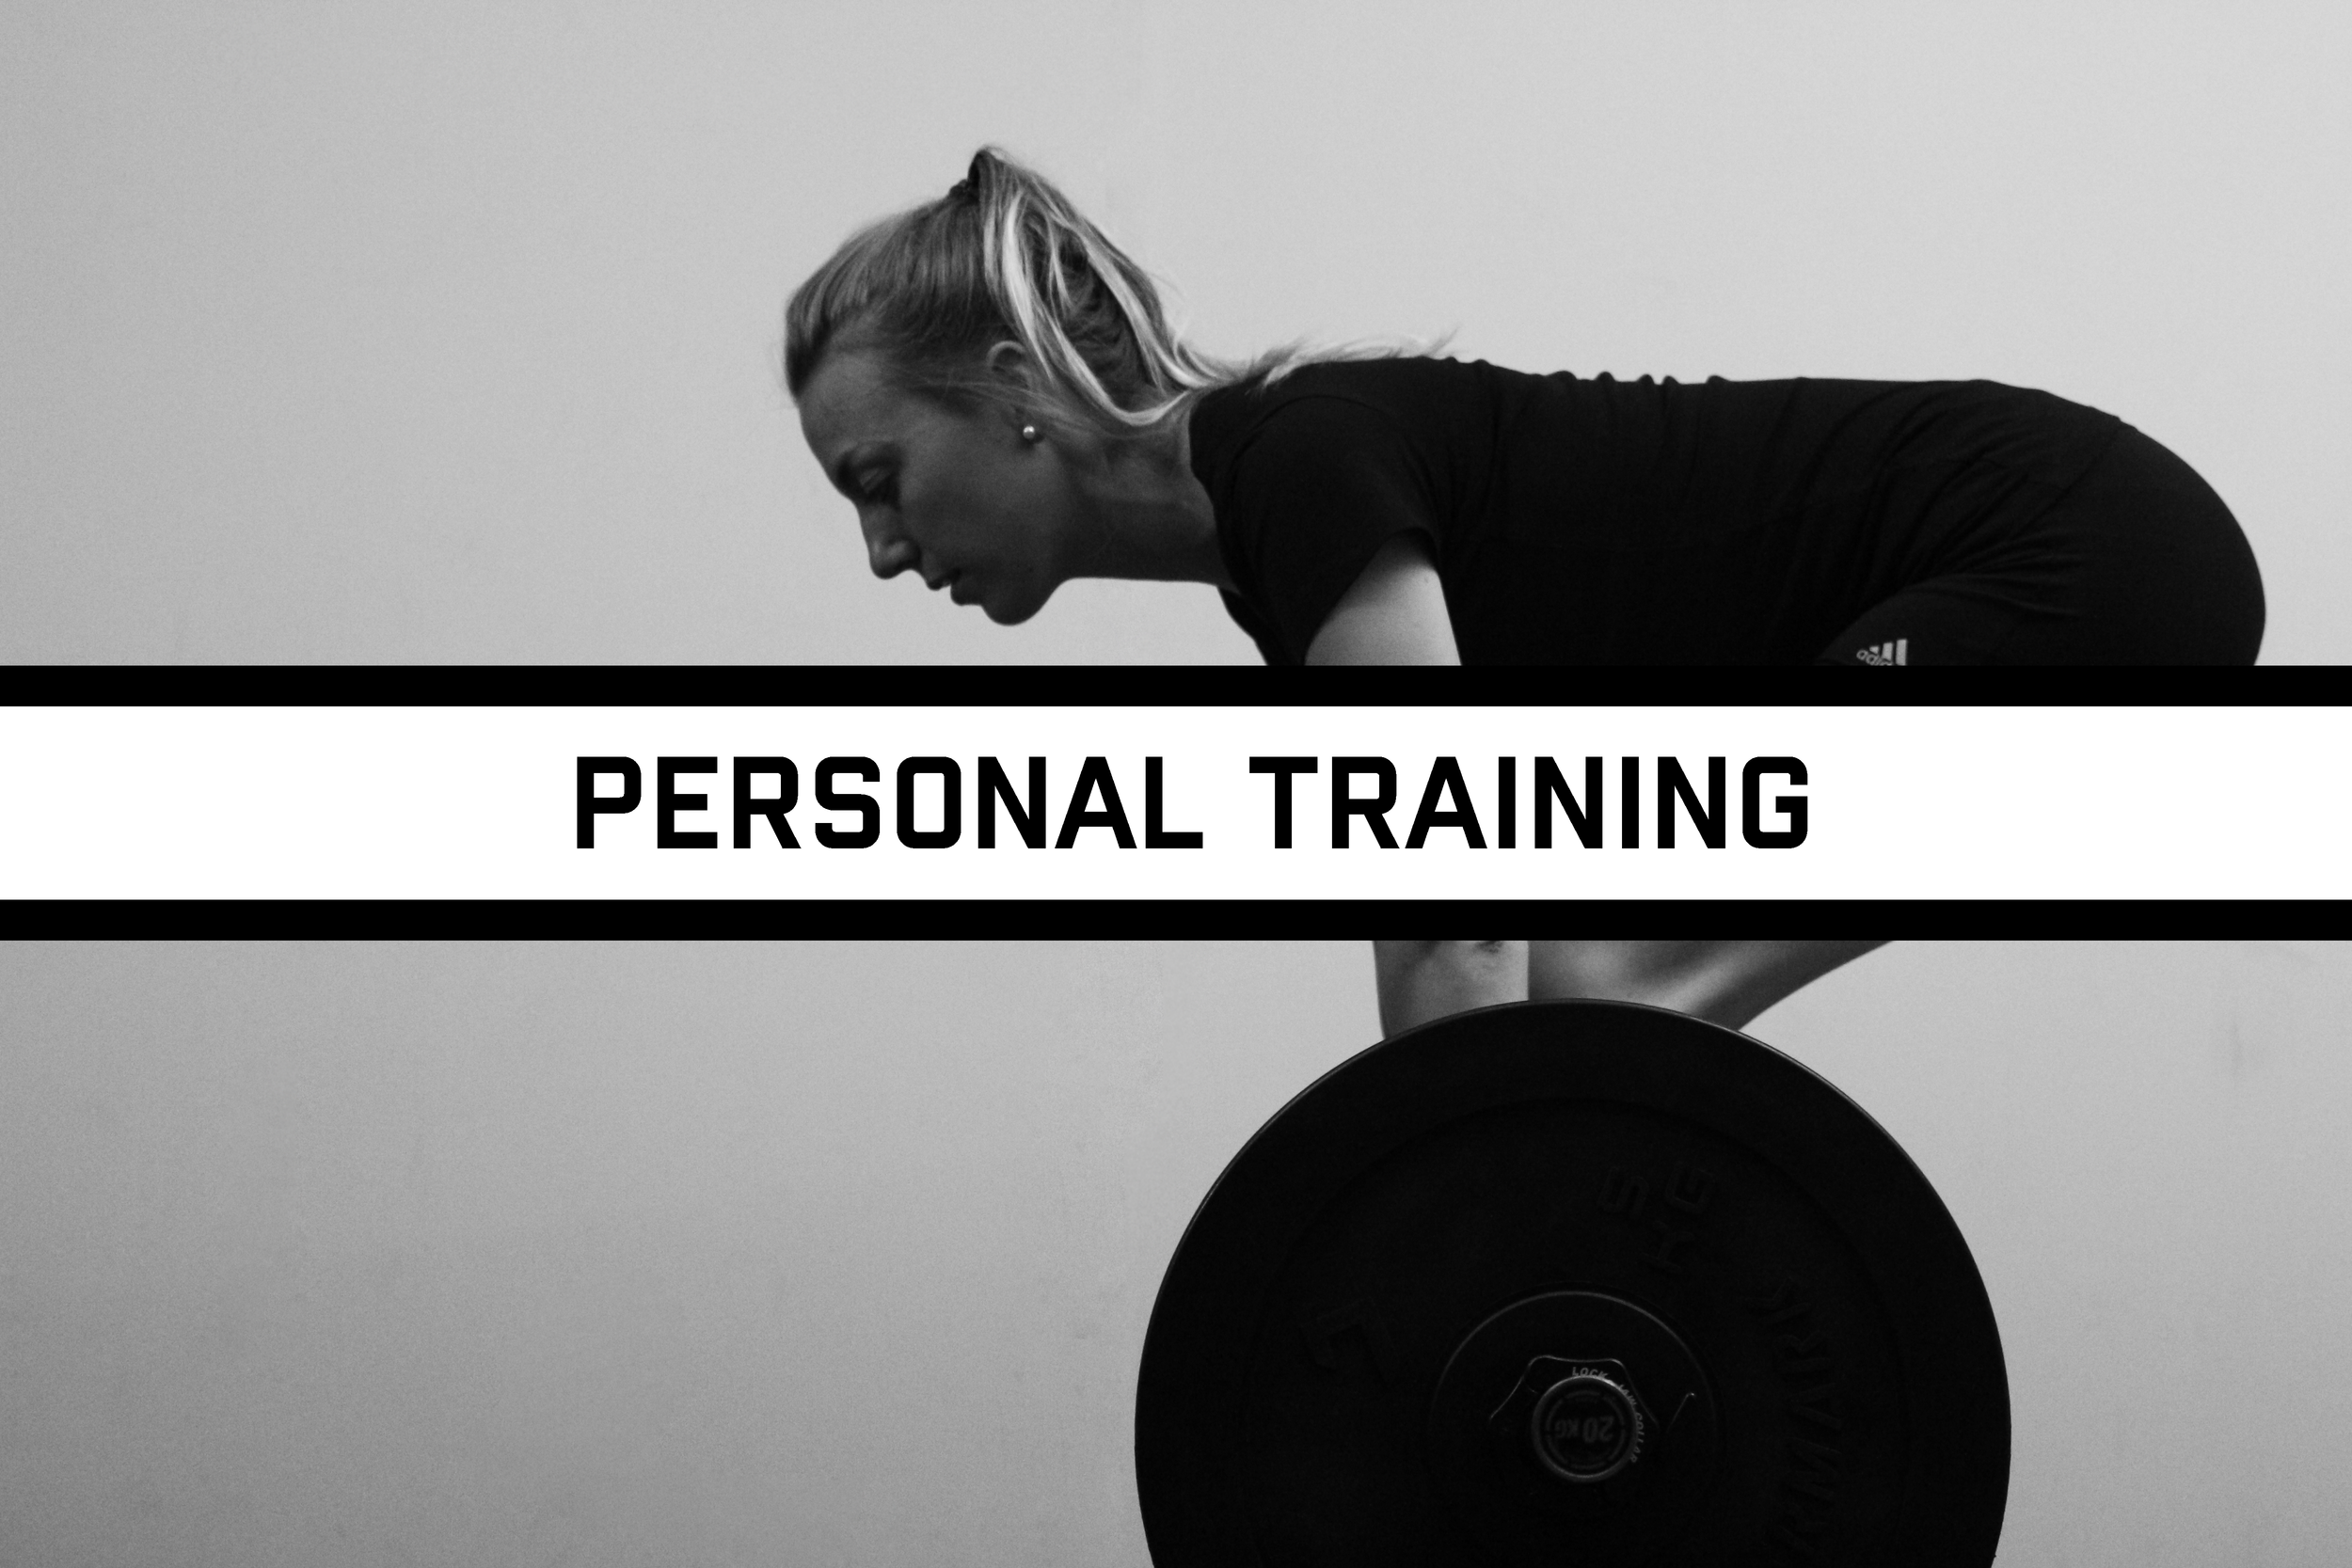 De-Ruijter-Personal-Training-Personal-Training.png